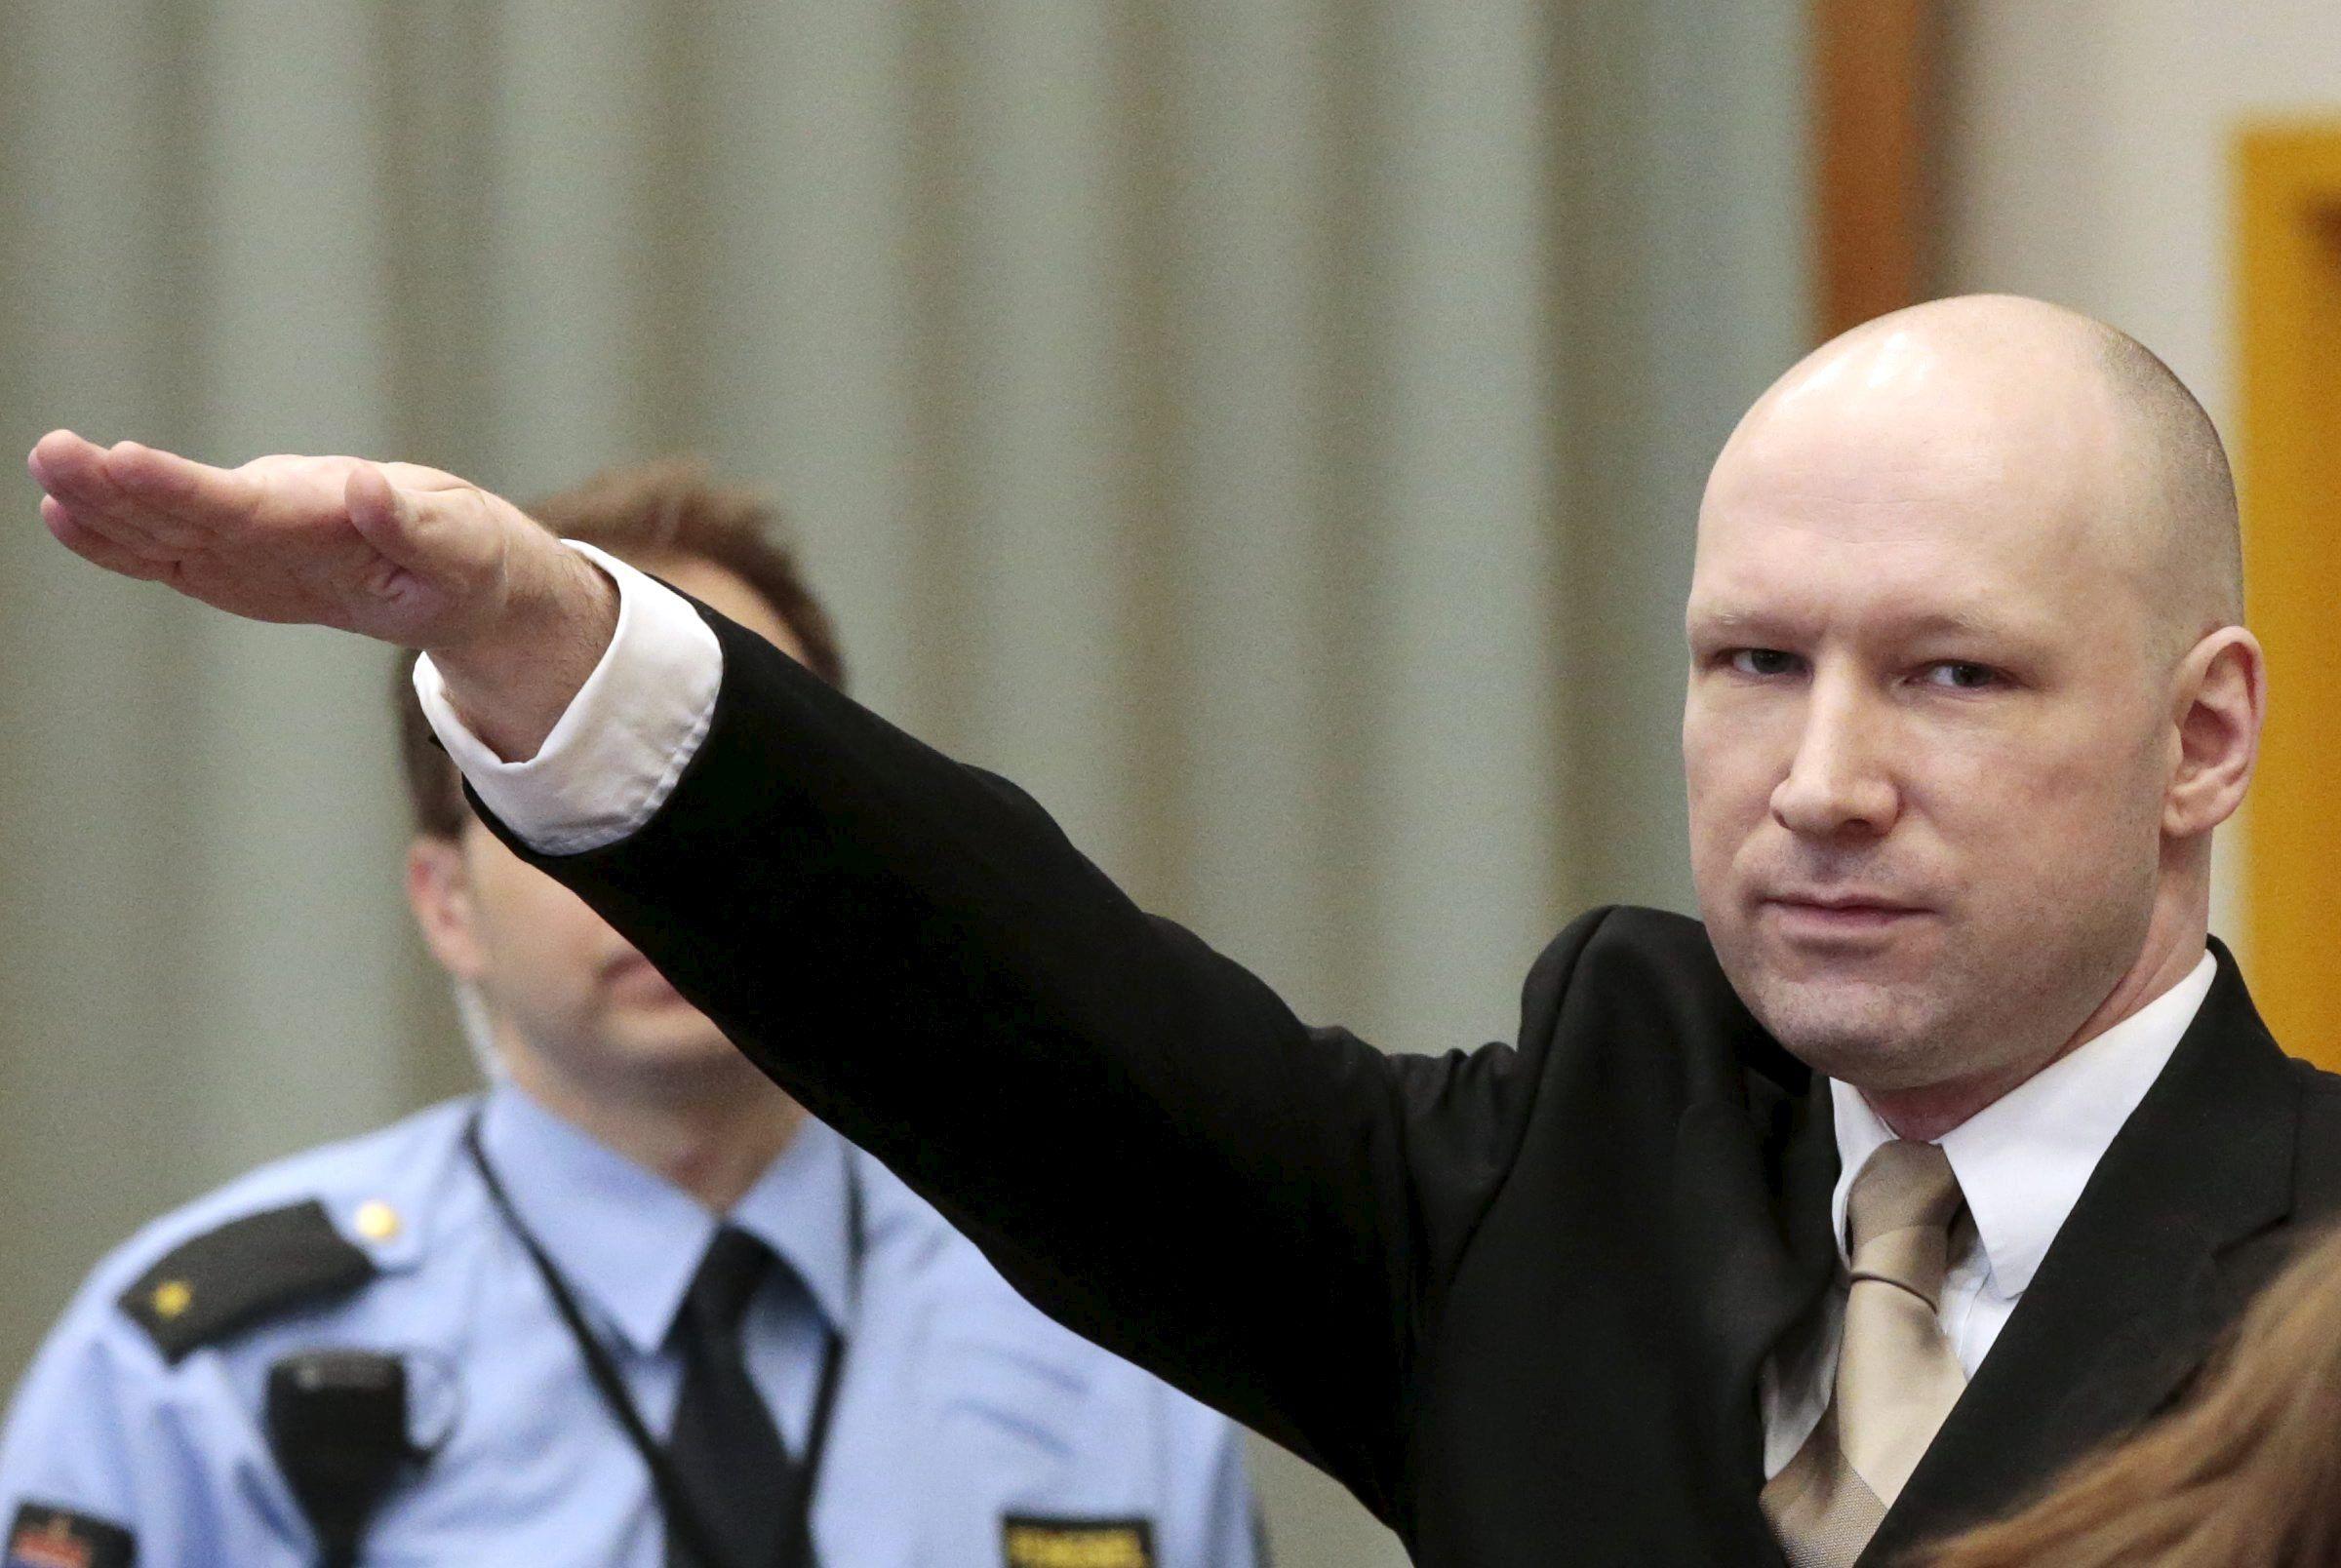 Брейвік і зіга, нацистське вітання